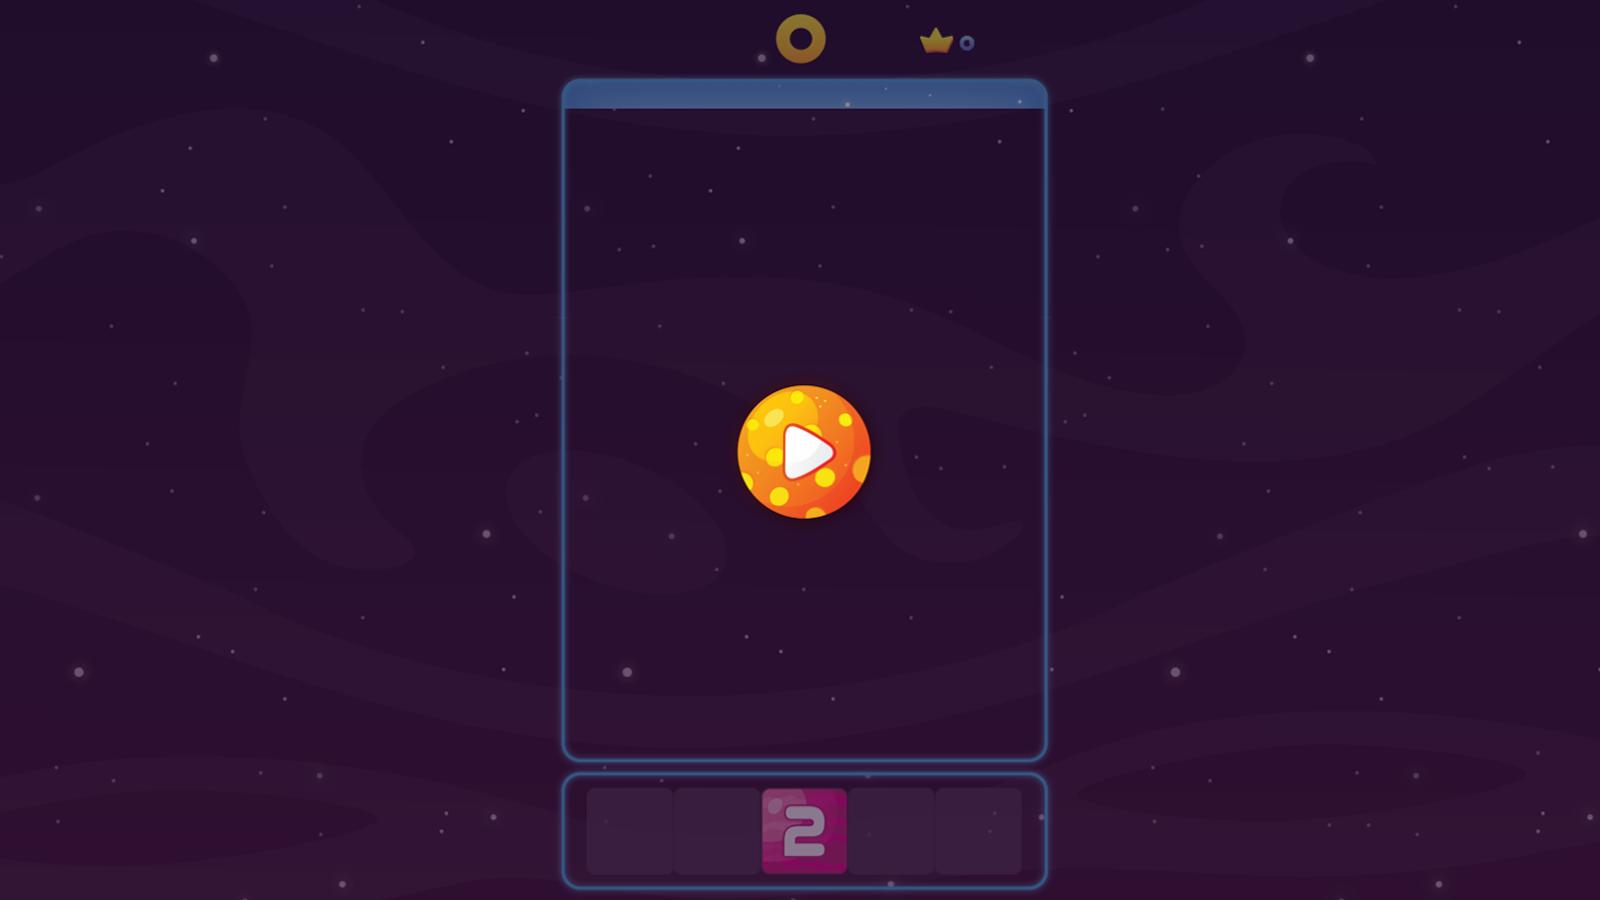 Merge Push Game Welcome Screenshot.